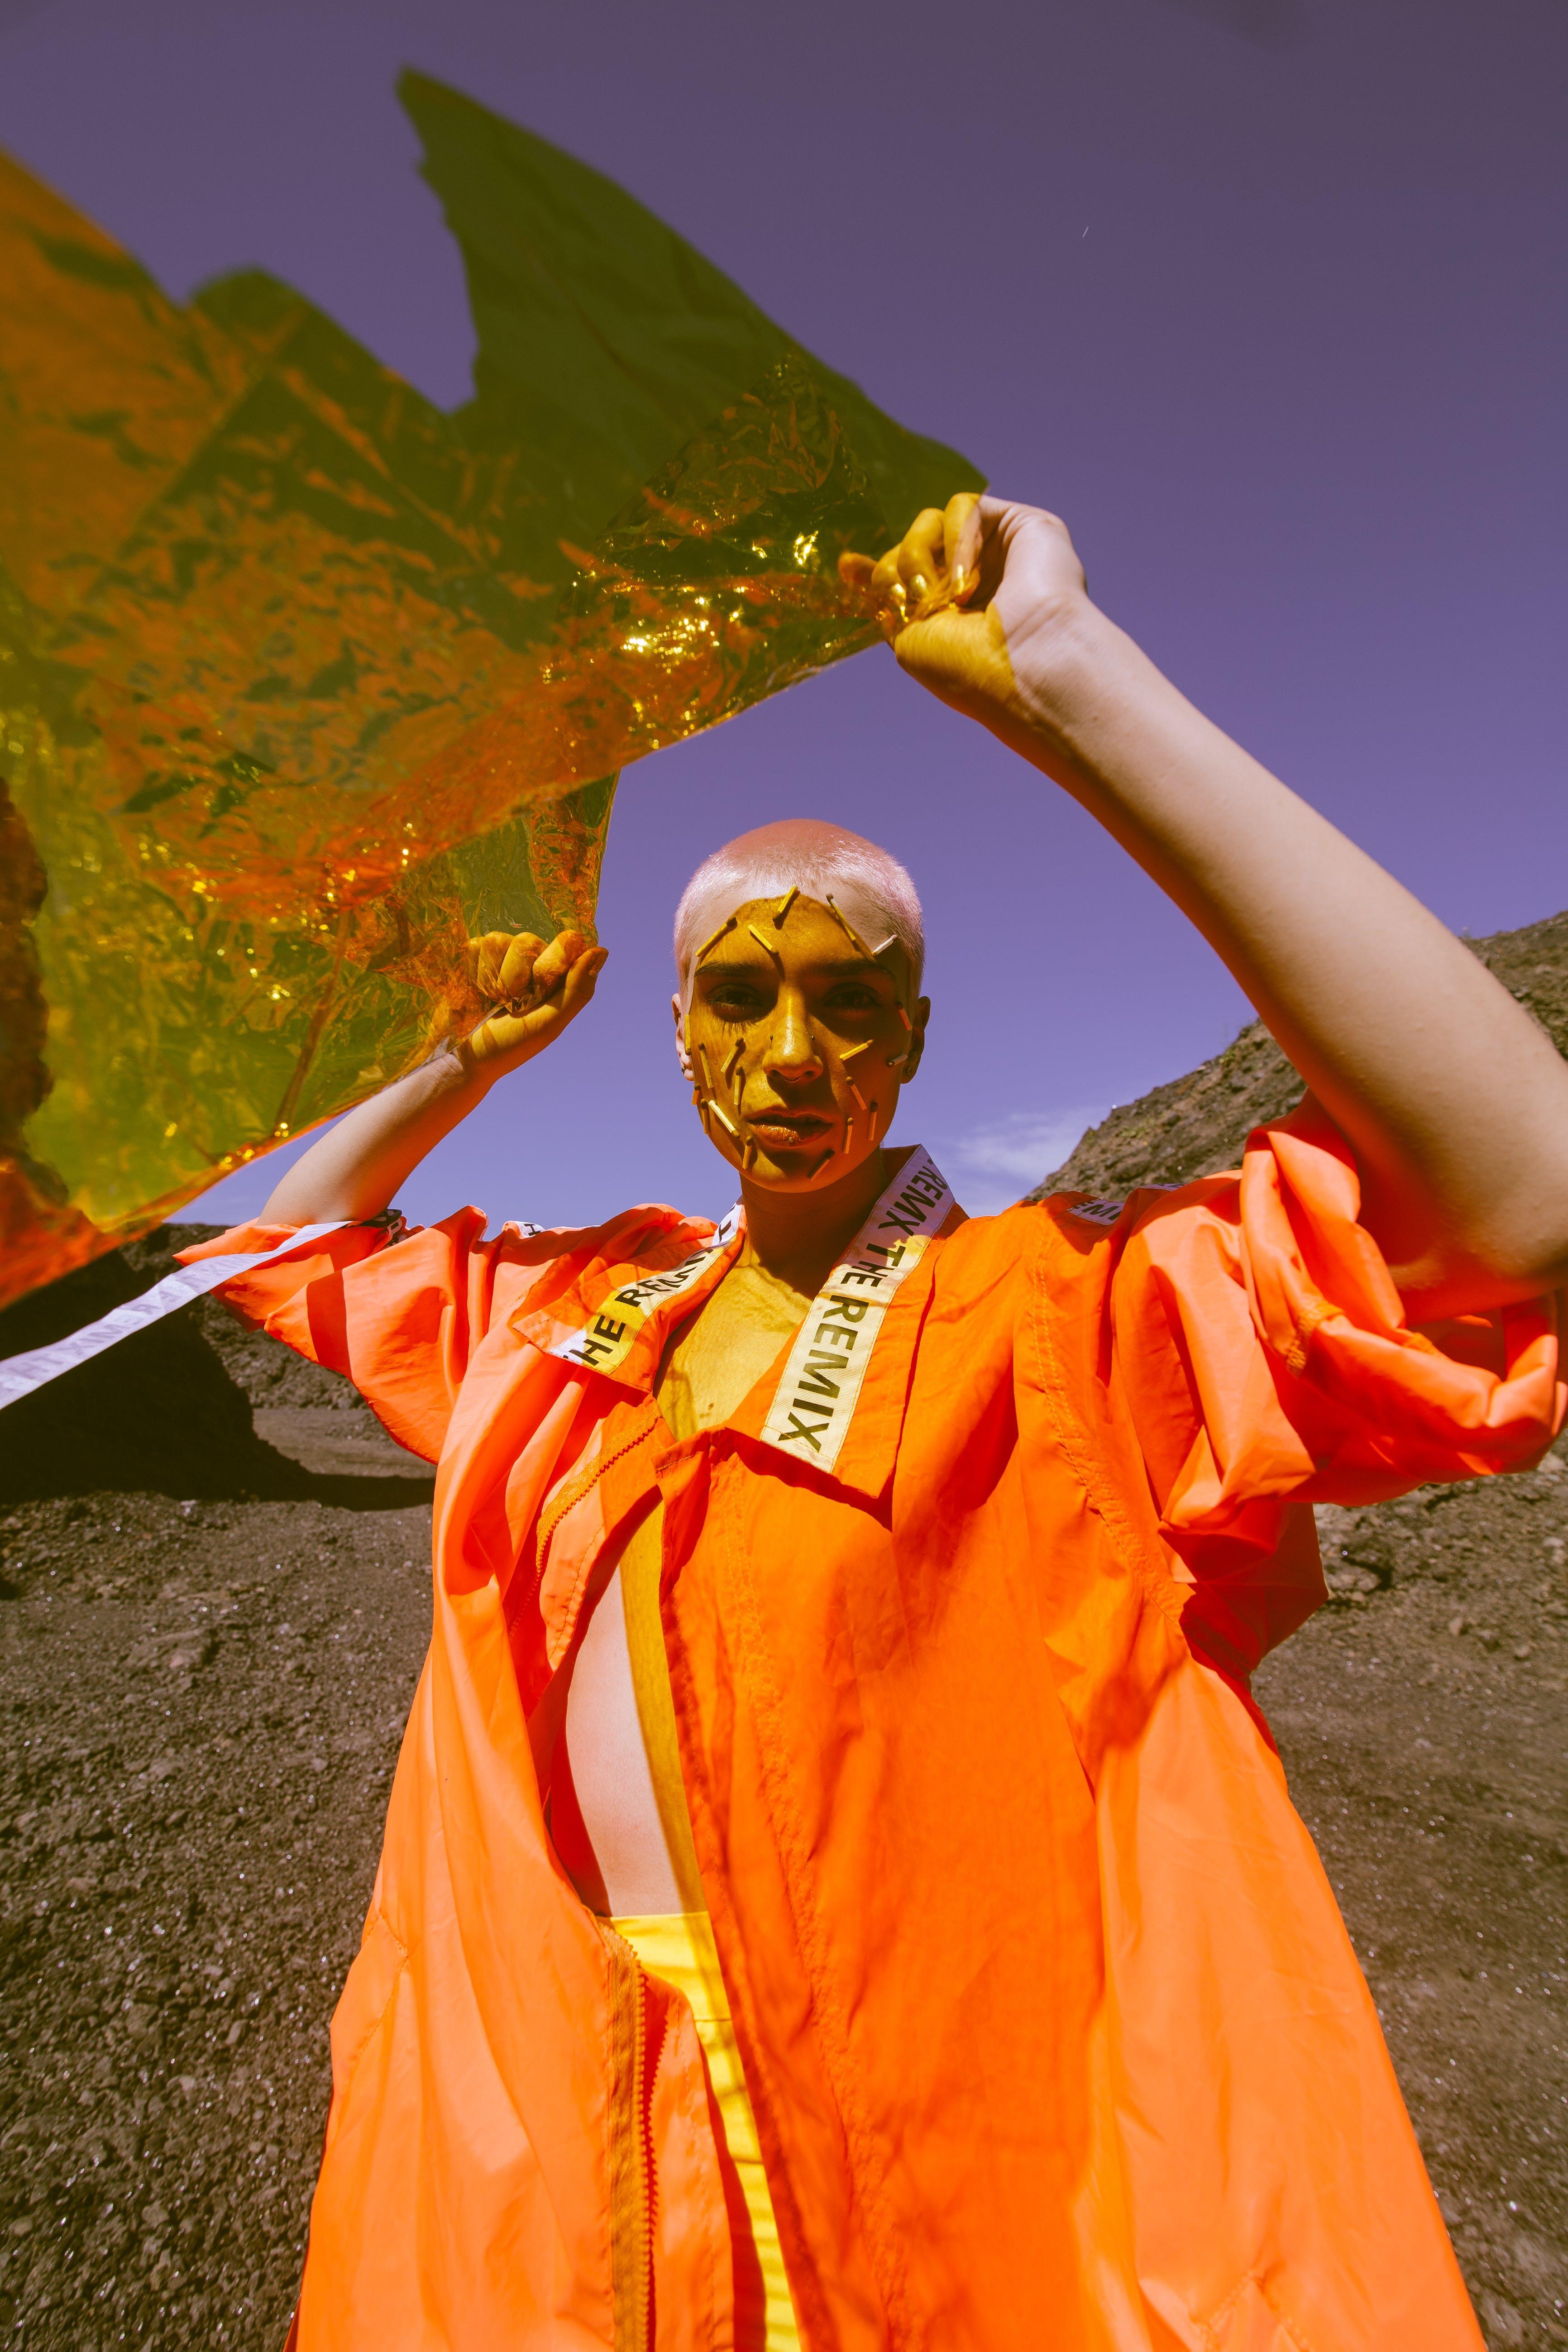 Women's Orange Dress